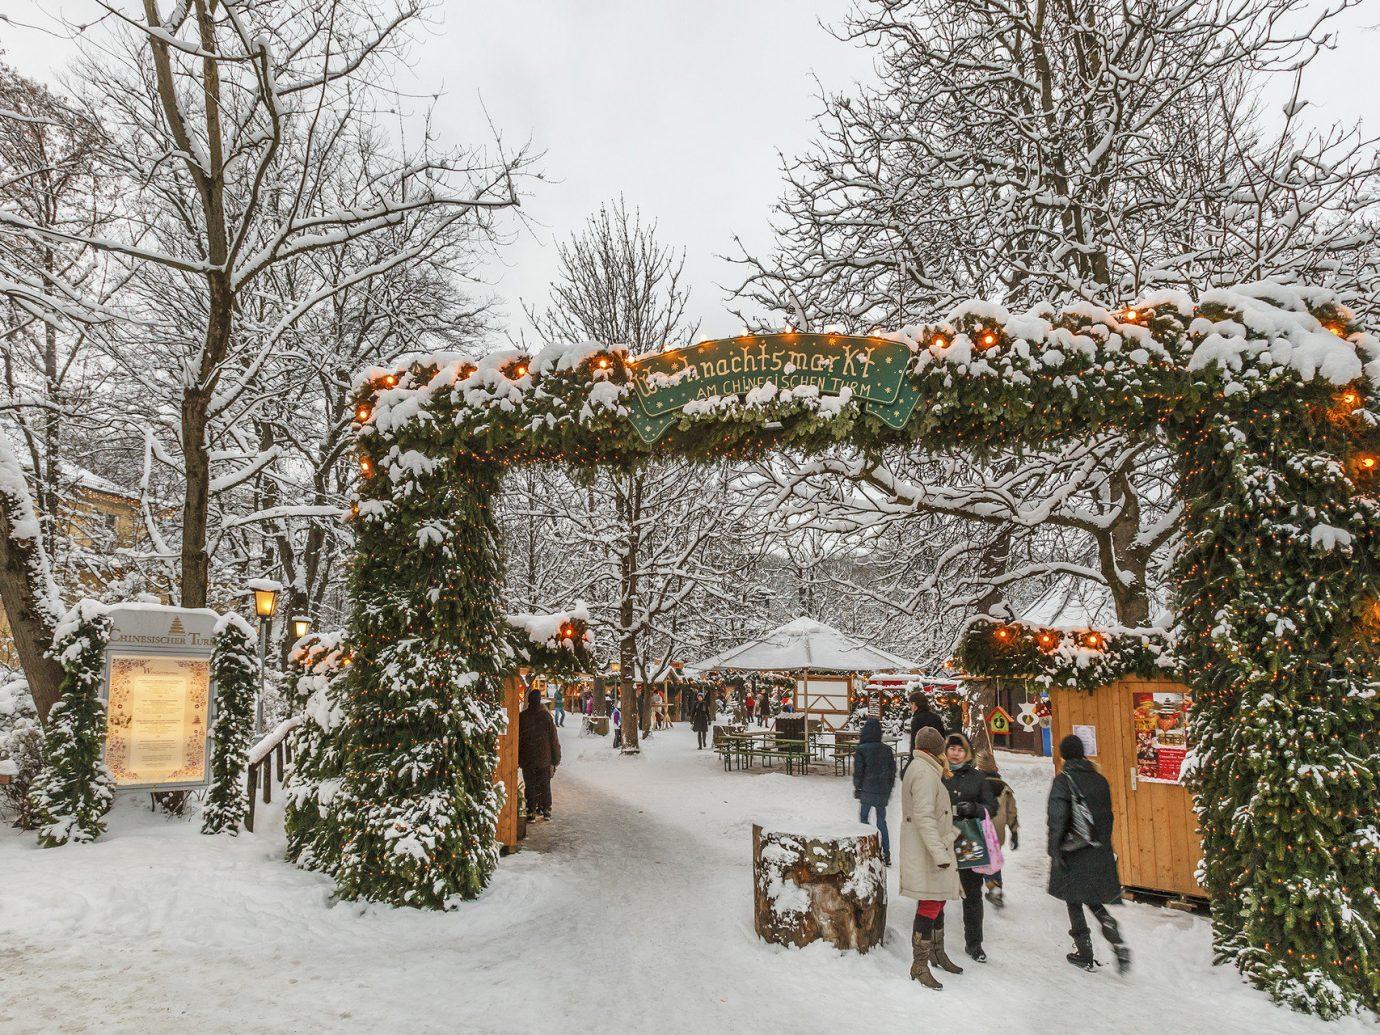 Trip Ideas tree snow outdoor Winter weather season christmas decoration group slope